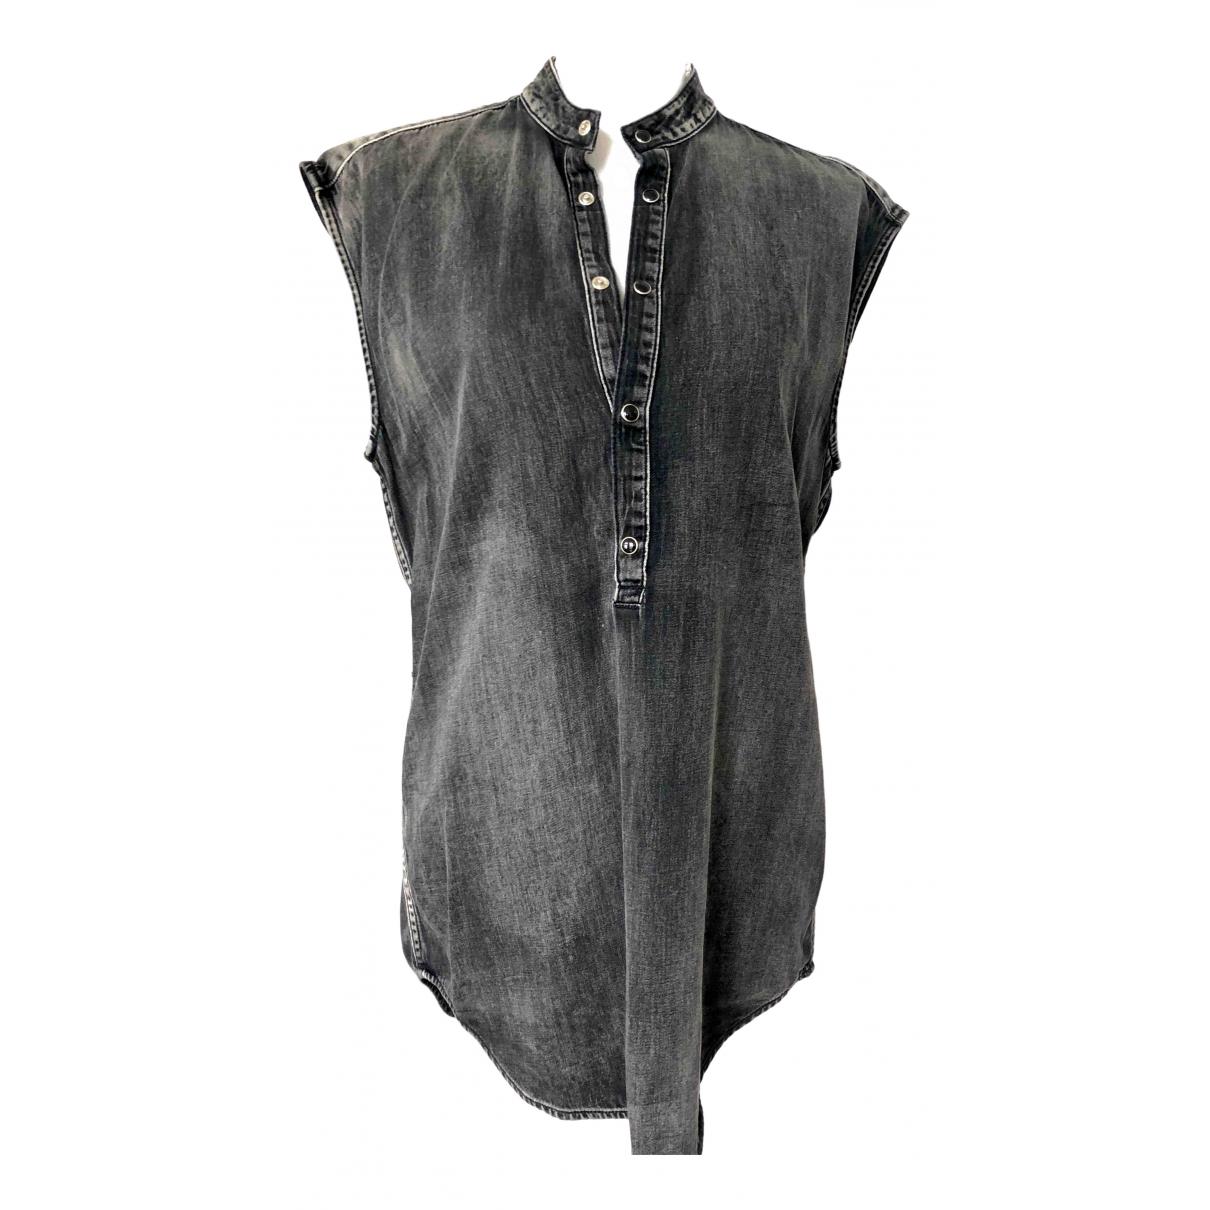 Blk Dnm \N Anthracite Denim - Jeans  top for Women S International